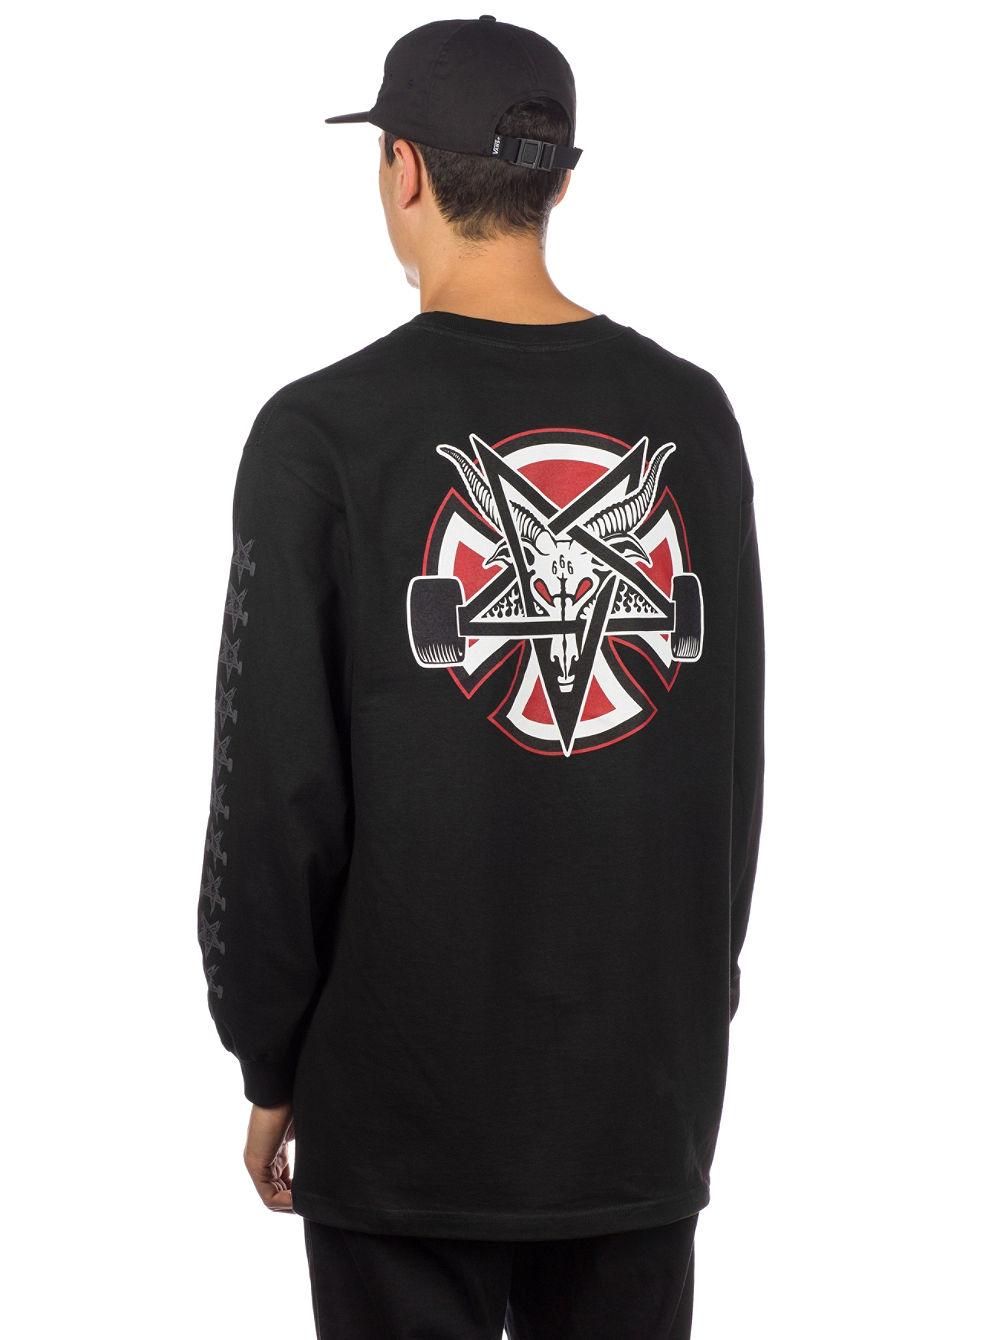 39510ece Buy Independent X Thrasher Pentagram Cross Long Sleeve T online at ...